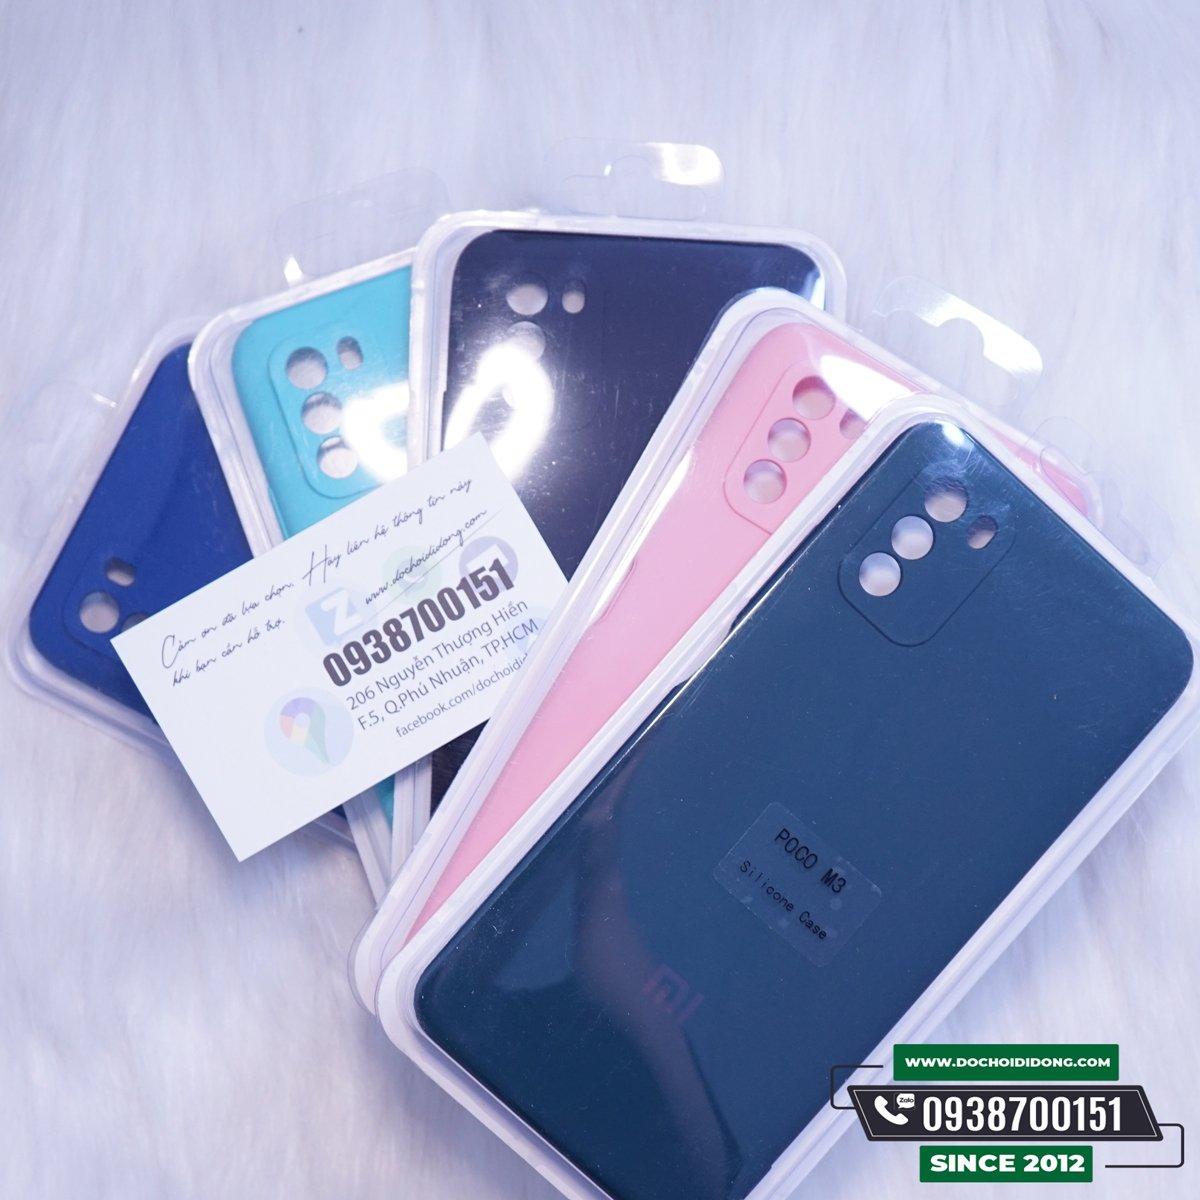 Ốp Lưng Xiaomi Poco M3 Silicon Chống Bẩn Cao Cấp